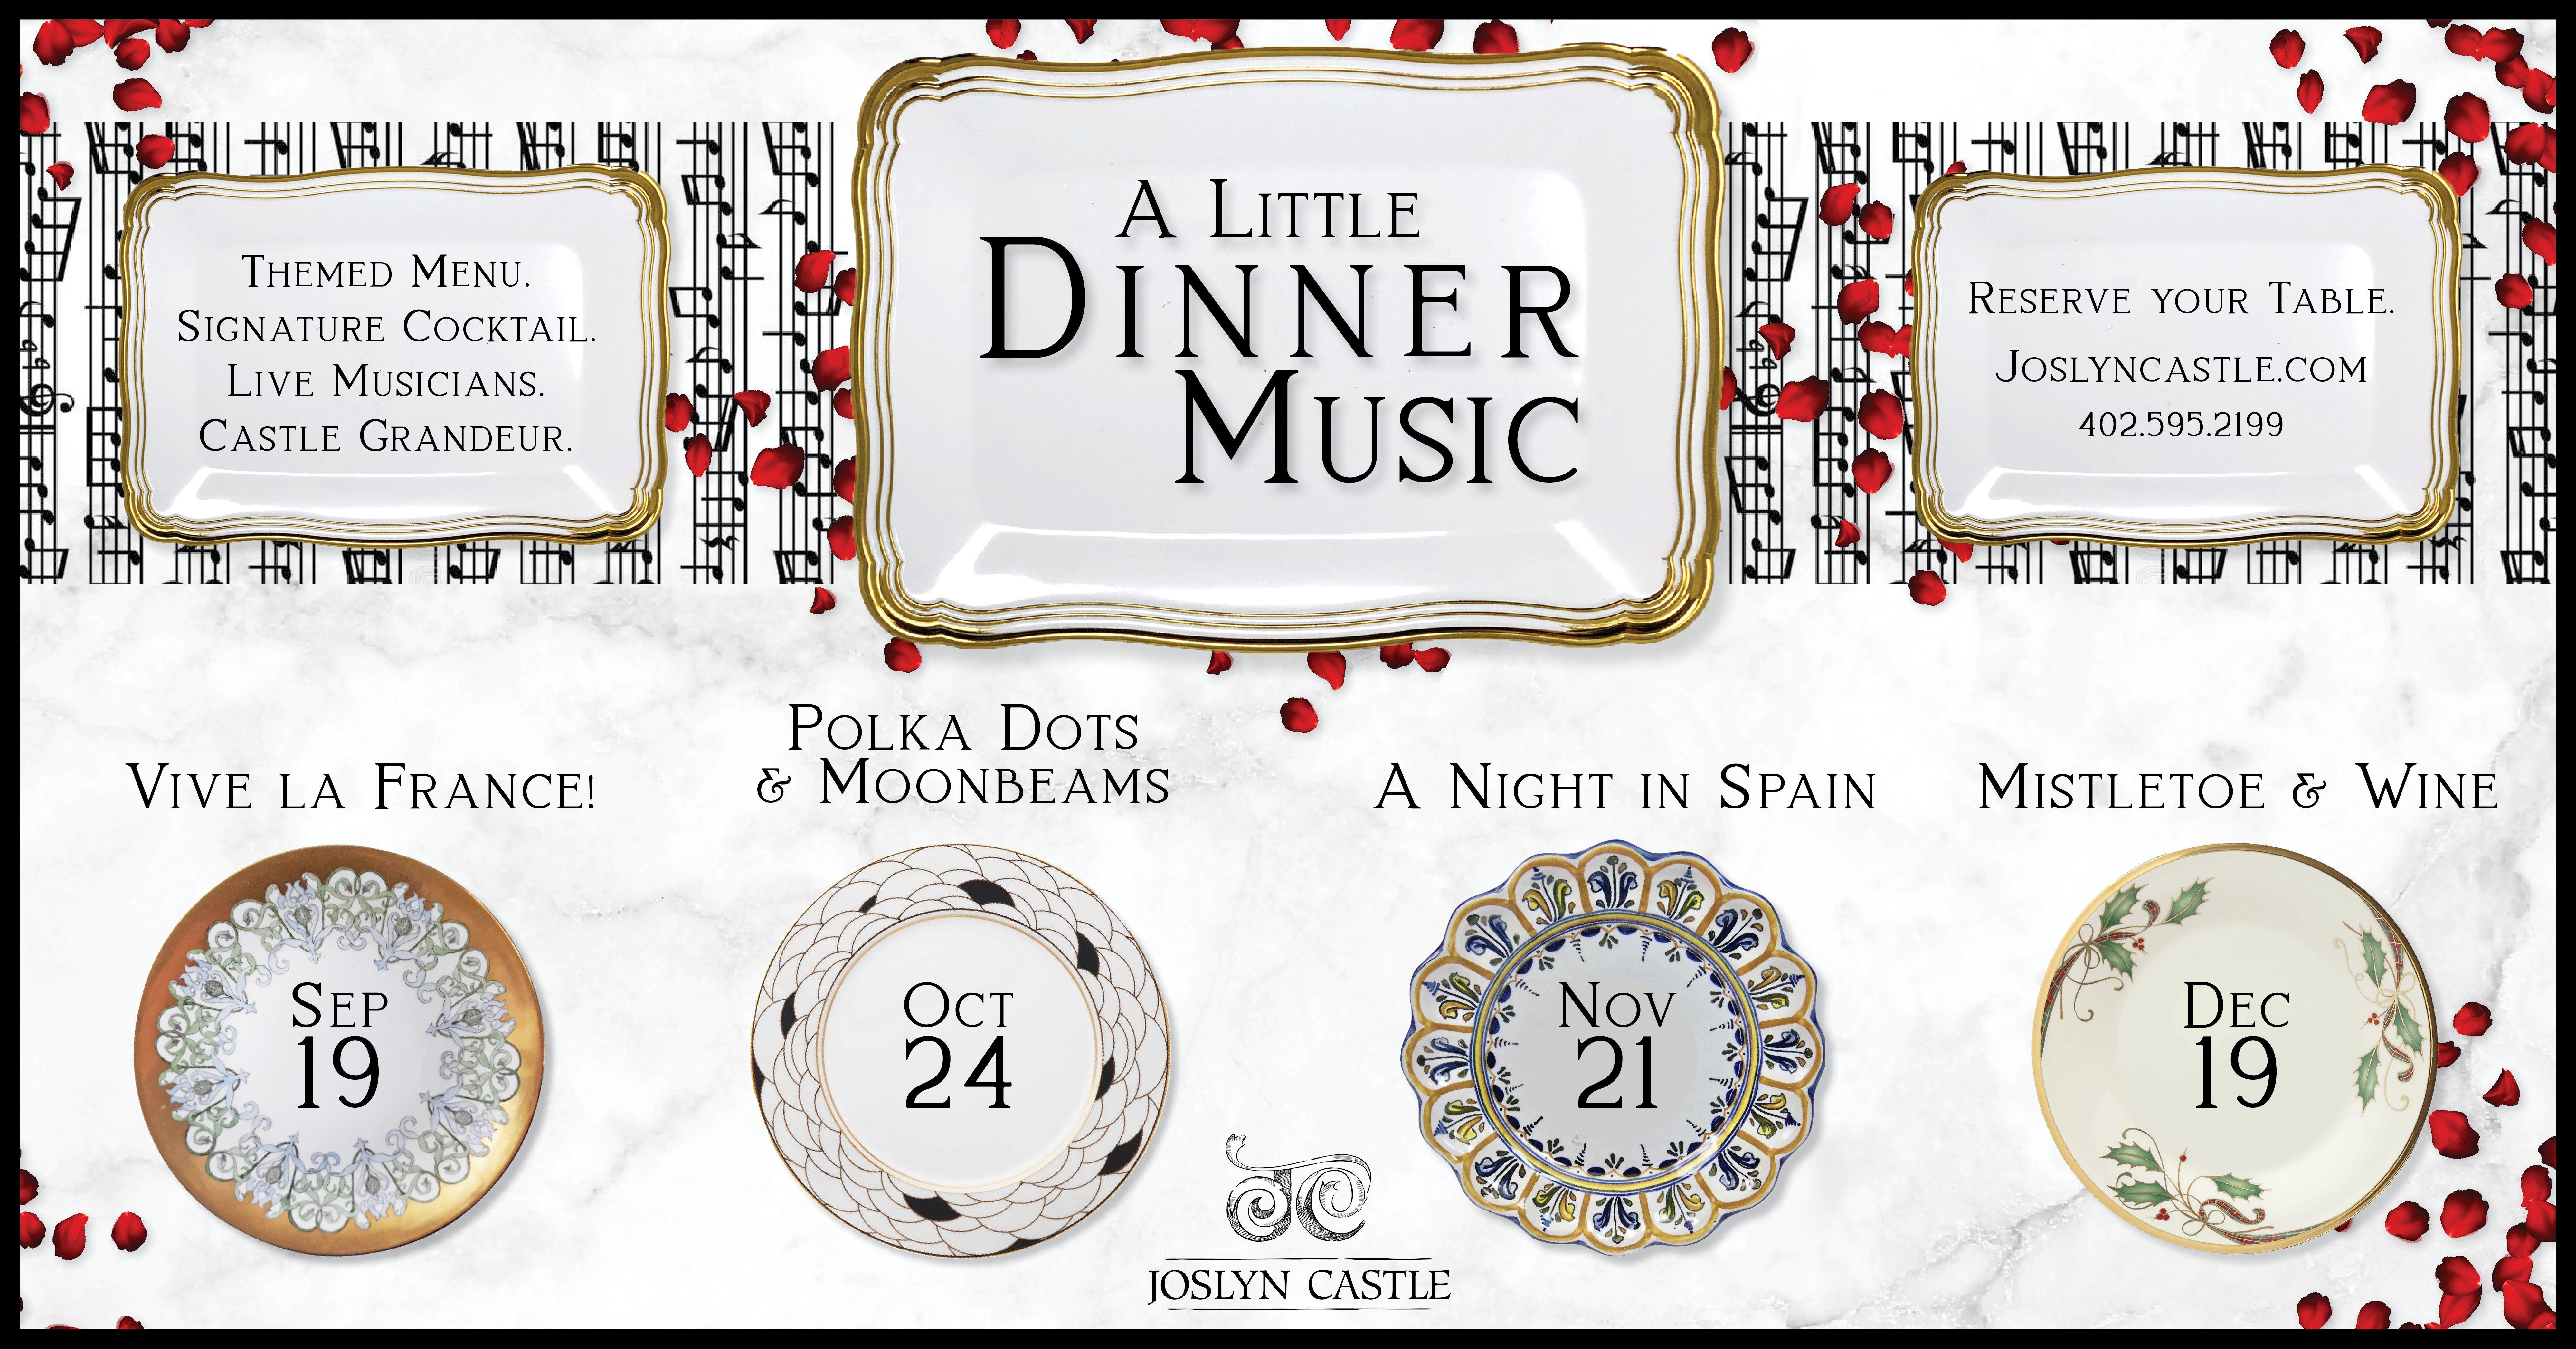 A Little Dinner Music III: A Night In Spain